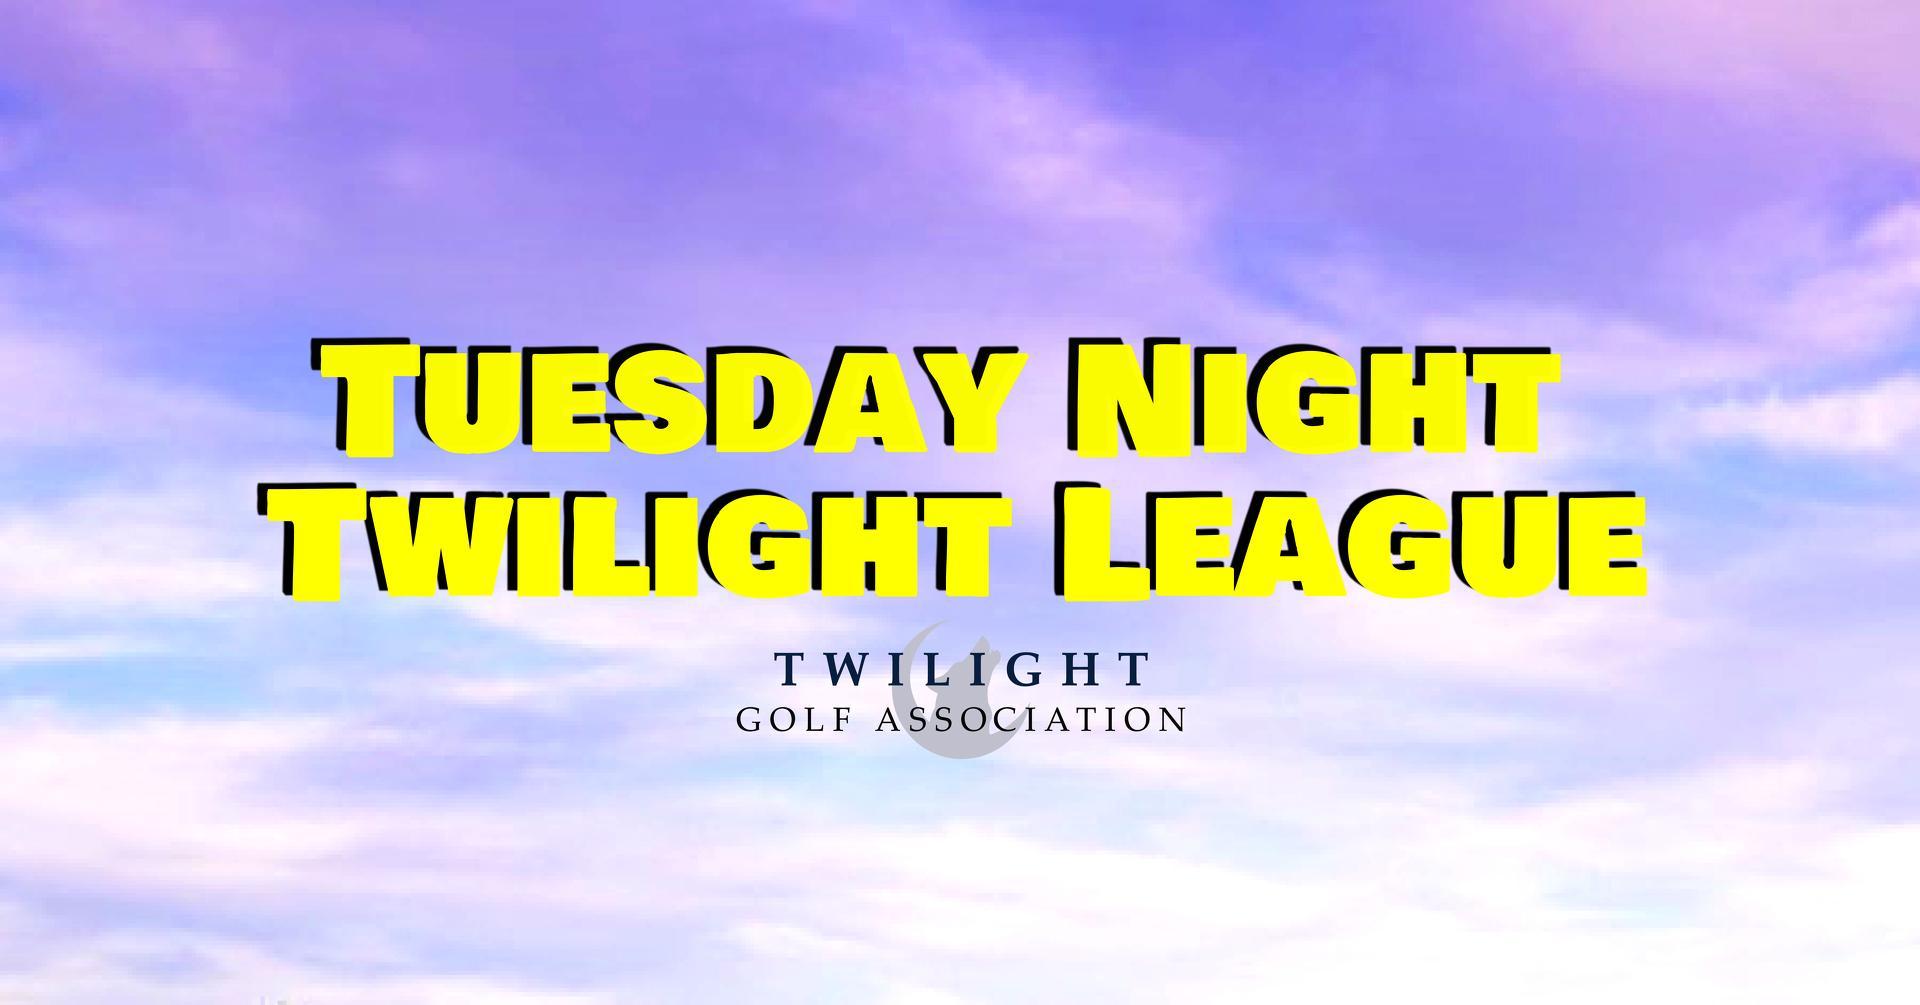 Tuesday Twilight League at Suffolk Golf Course